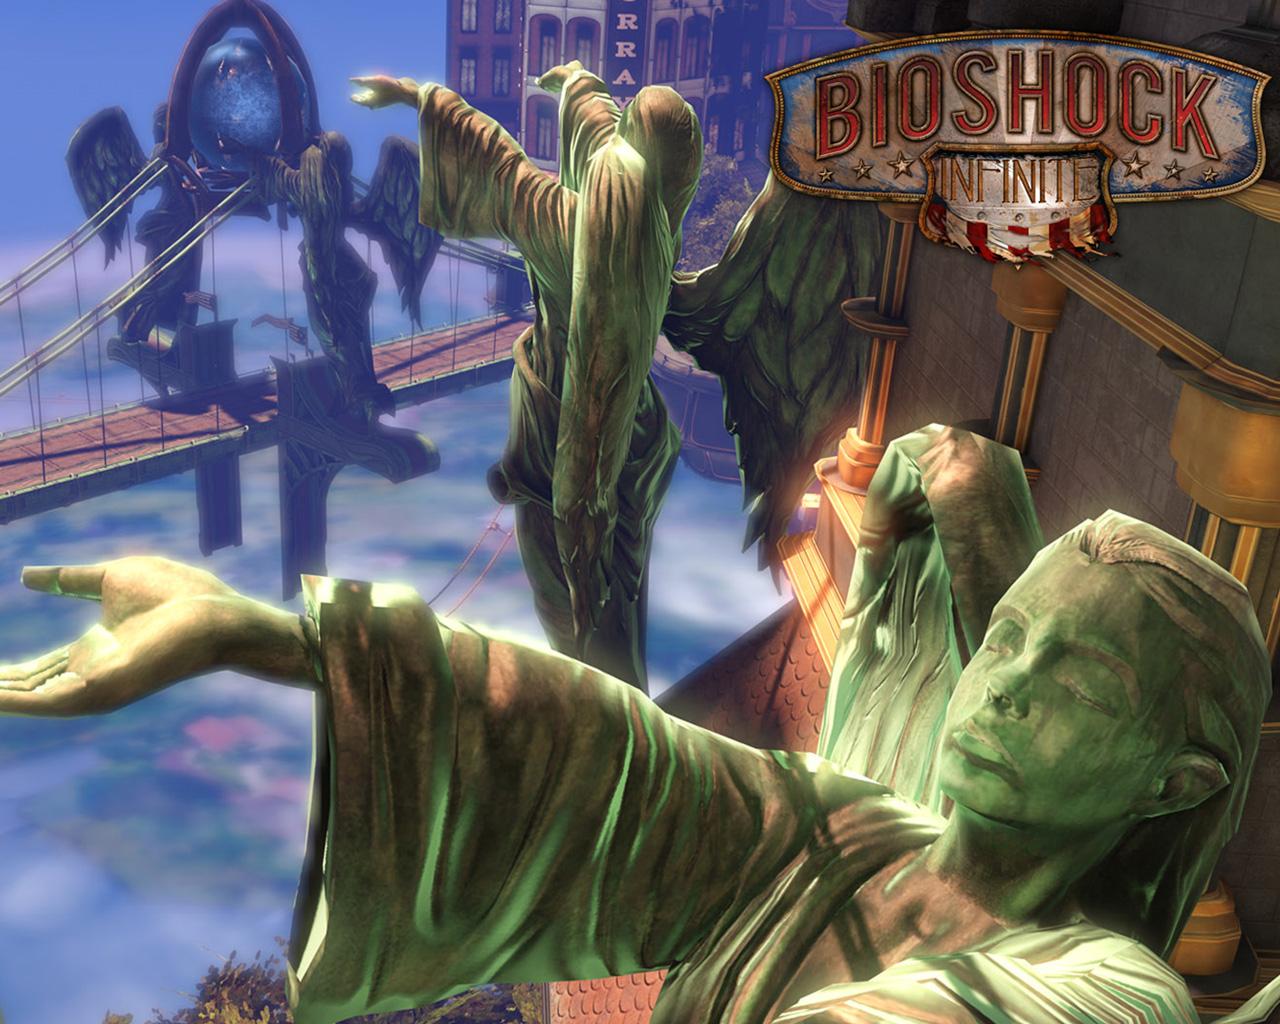 Free Bioshock Infinite Wallpaper in 1280x1024